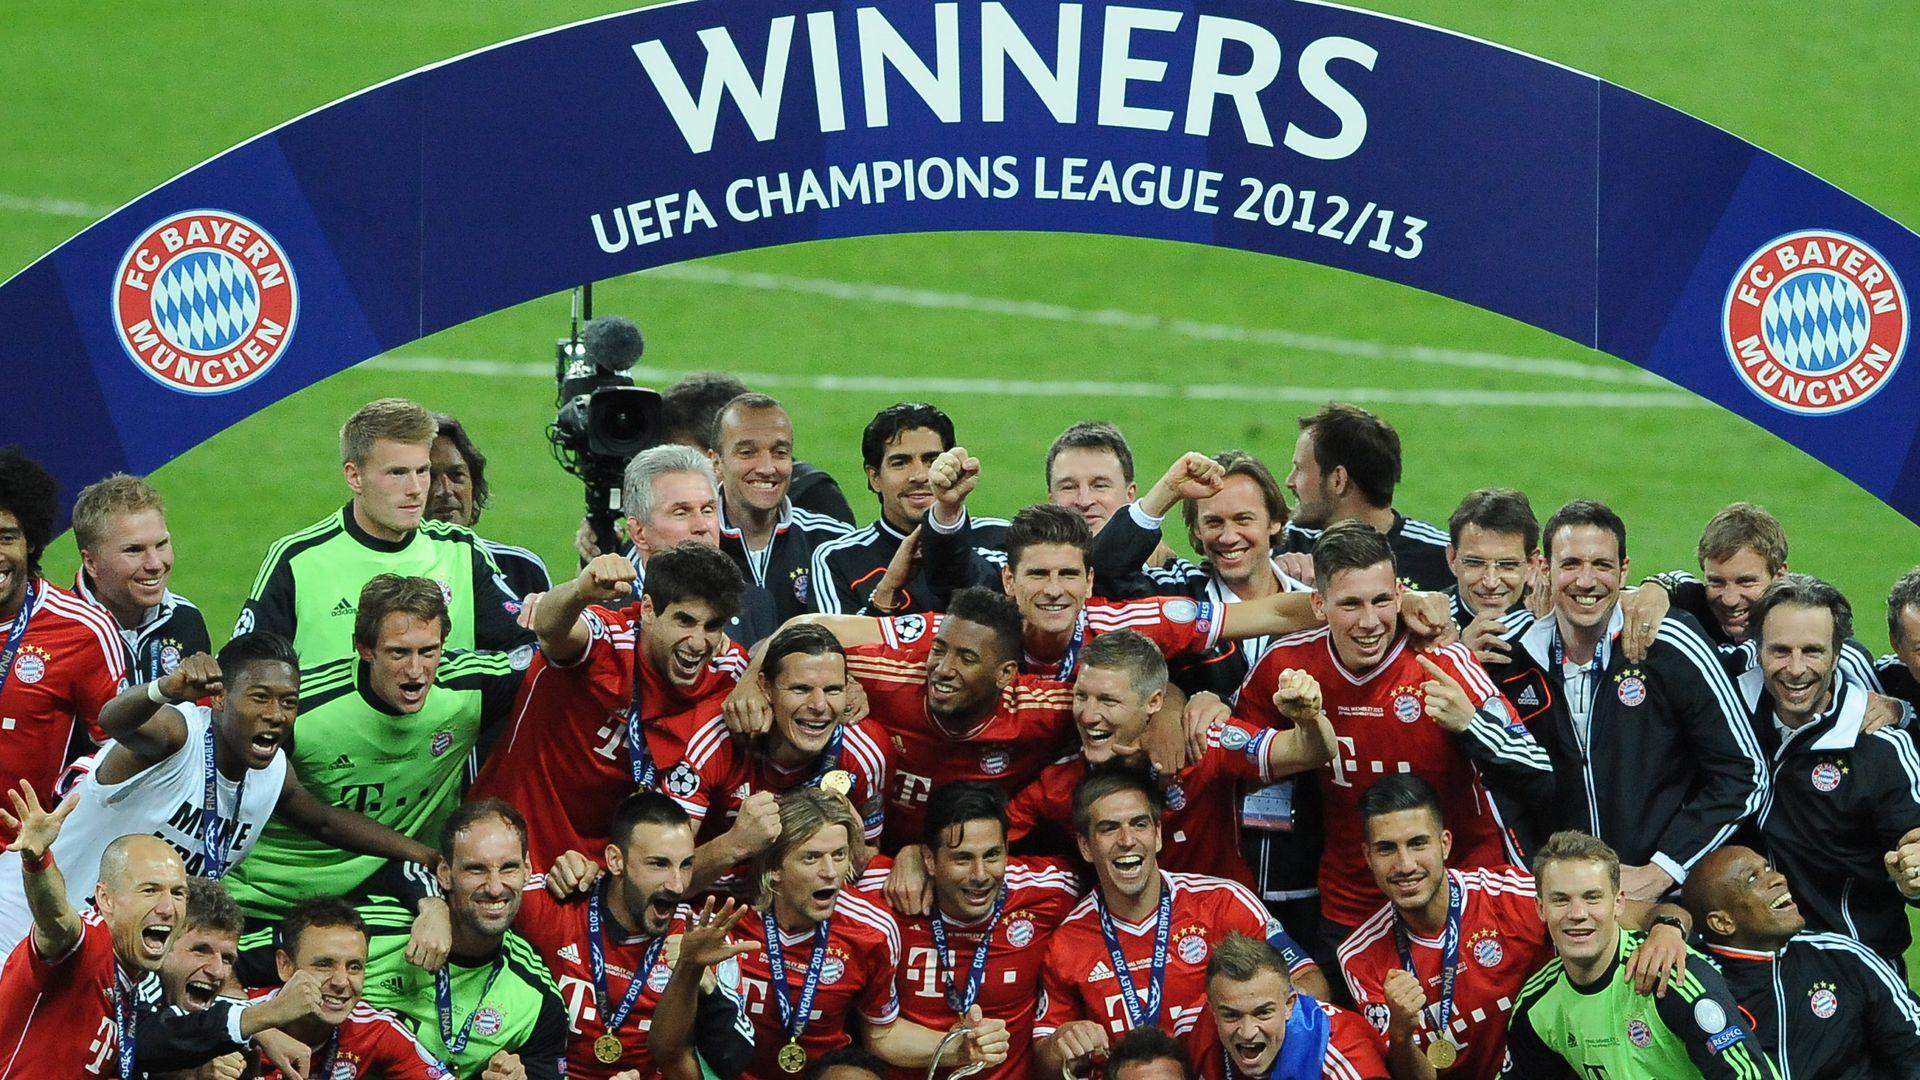 Dfb Pokal Sieger Champions League